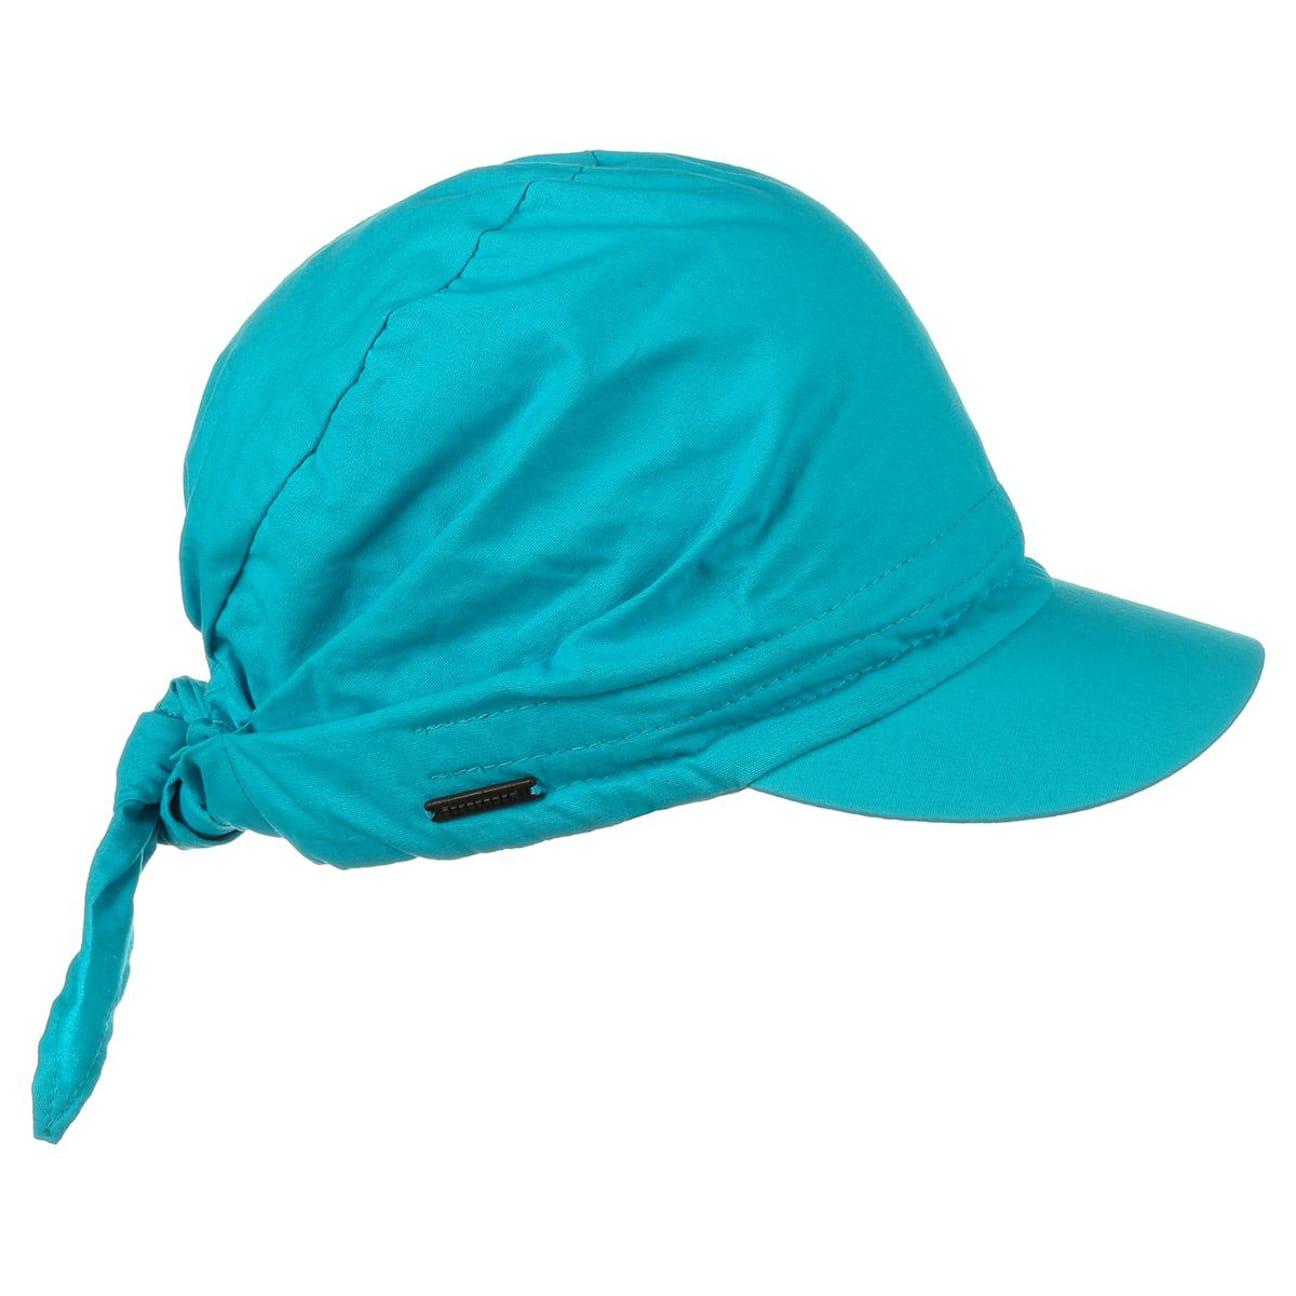 Bandana con Visera by Seeberger - Gorros - sombreroshop.es 4ded60e4451